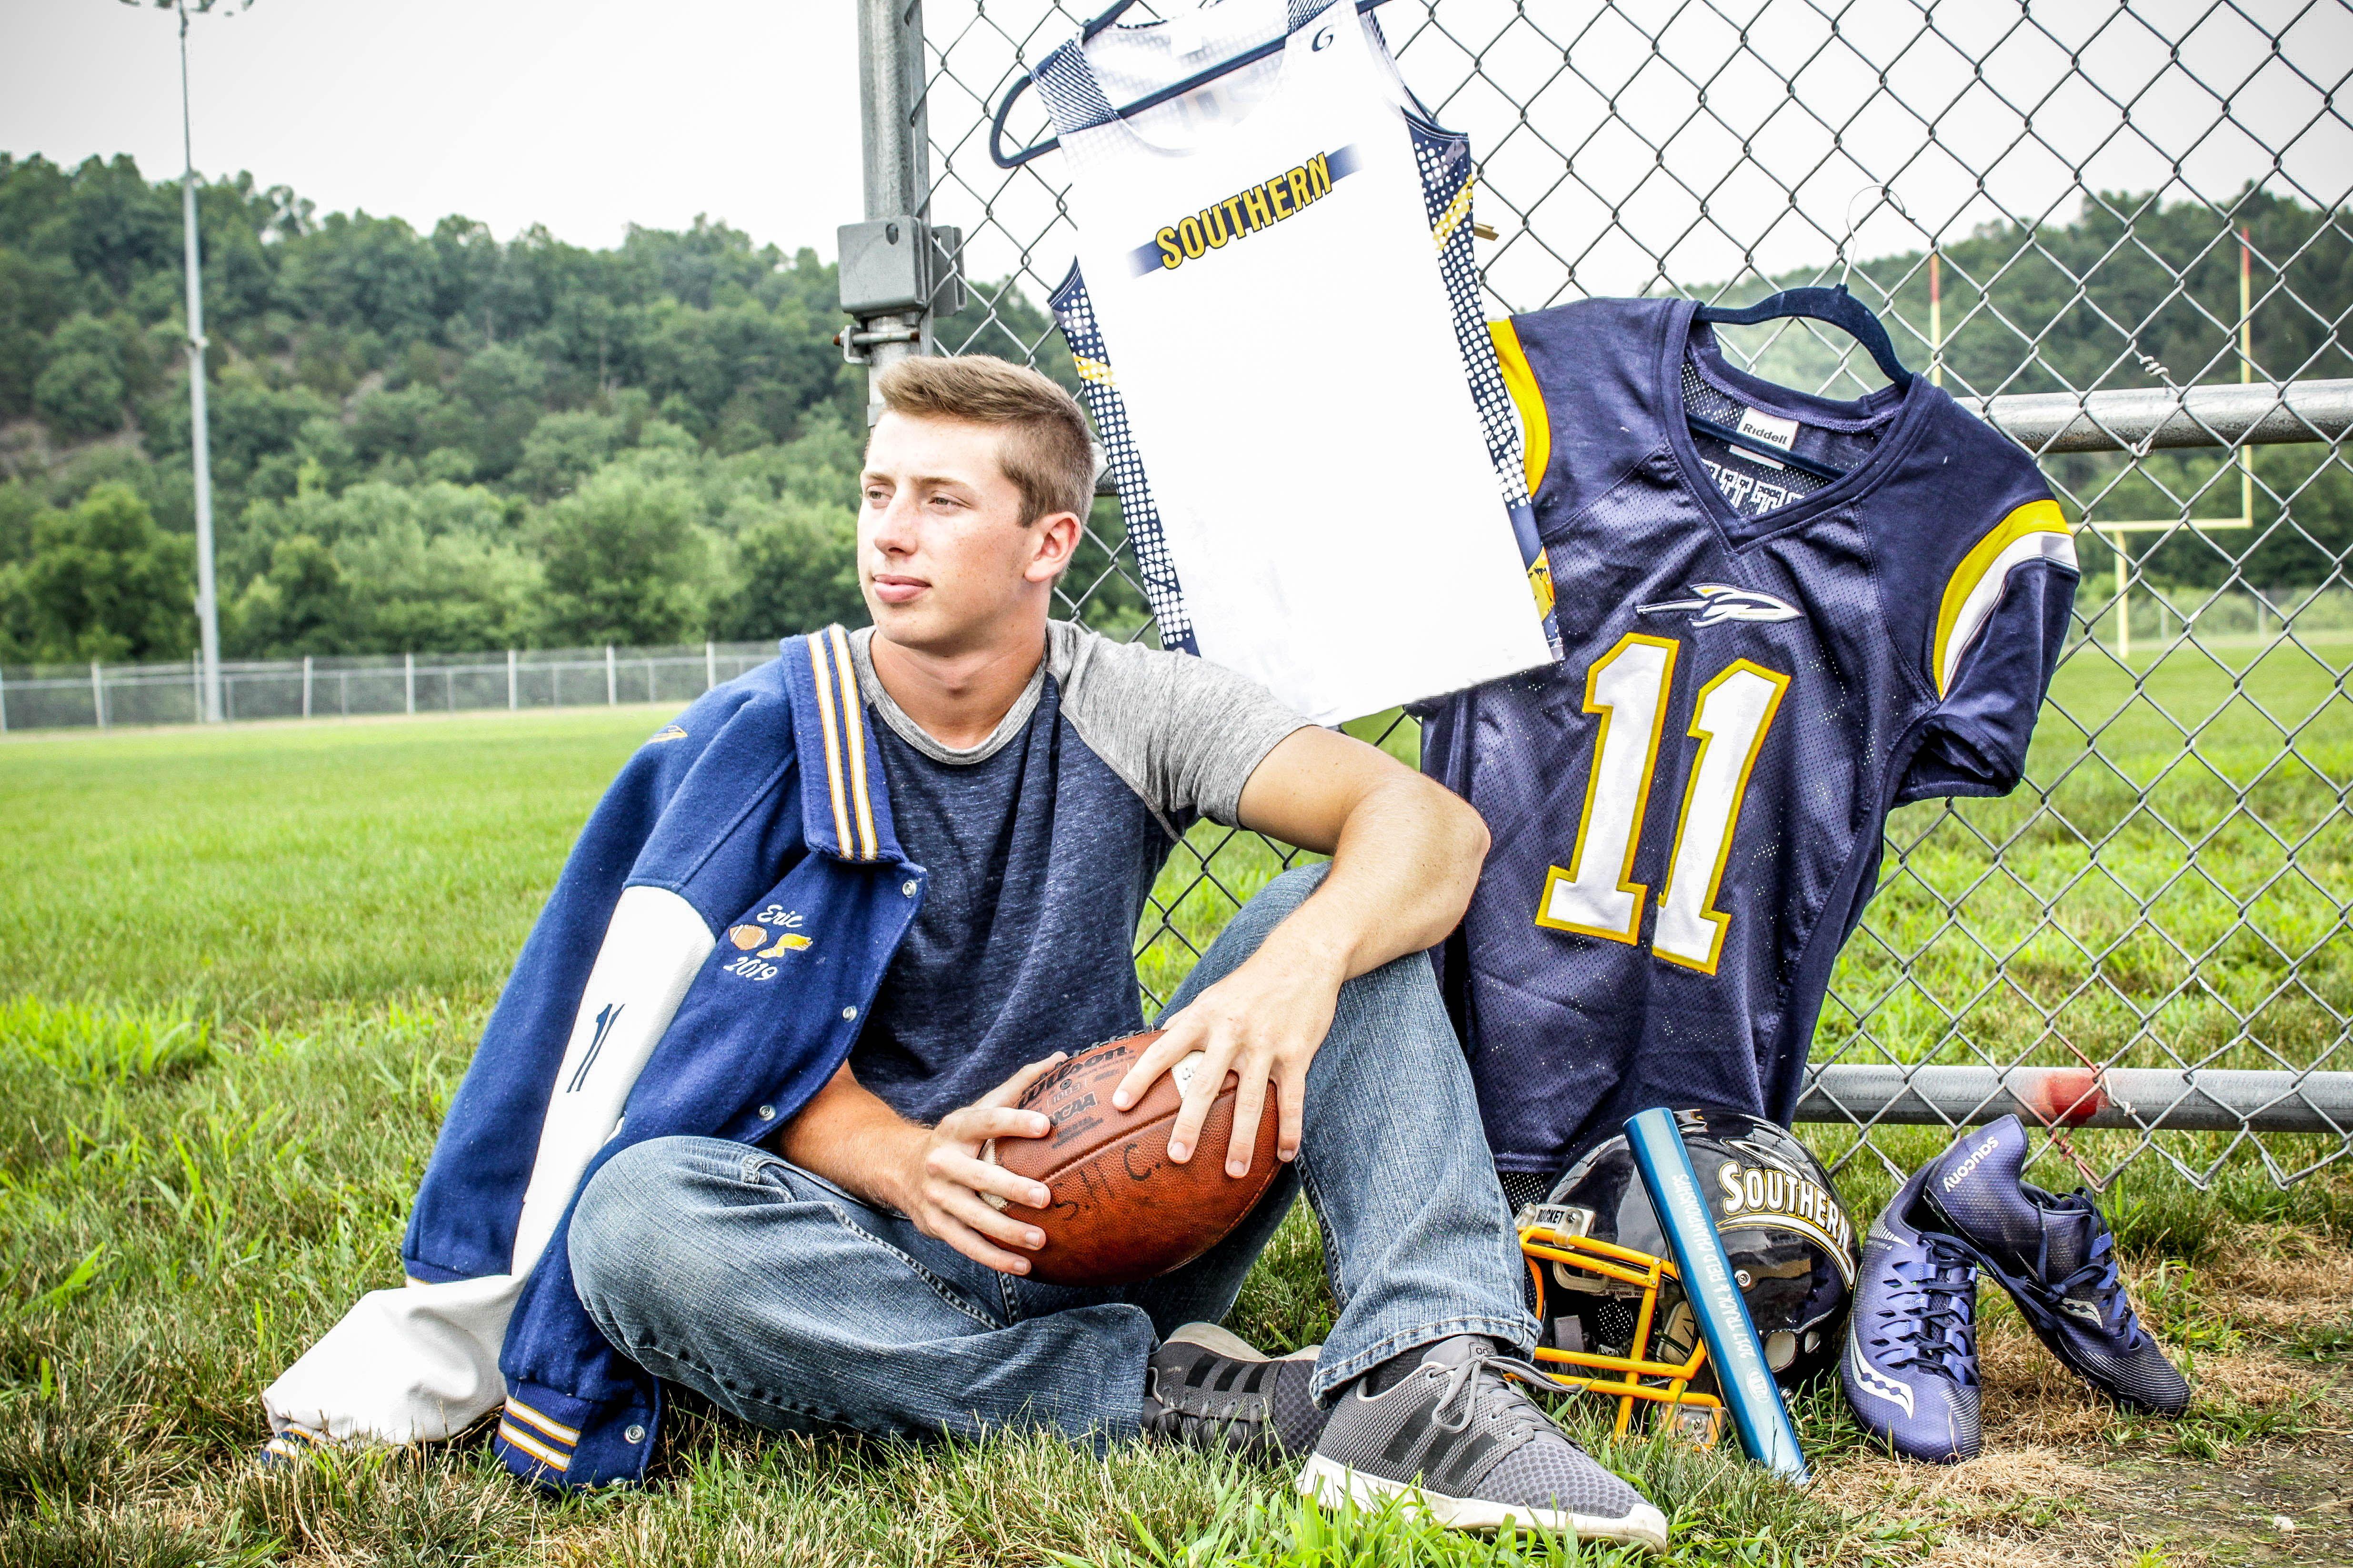 senior picture ideas, football, track, sport | Track ...